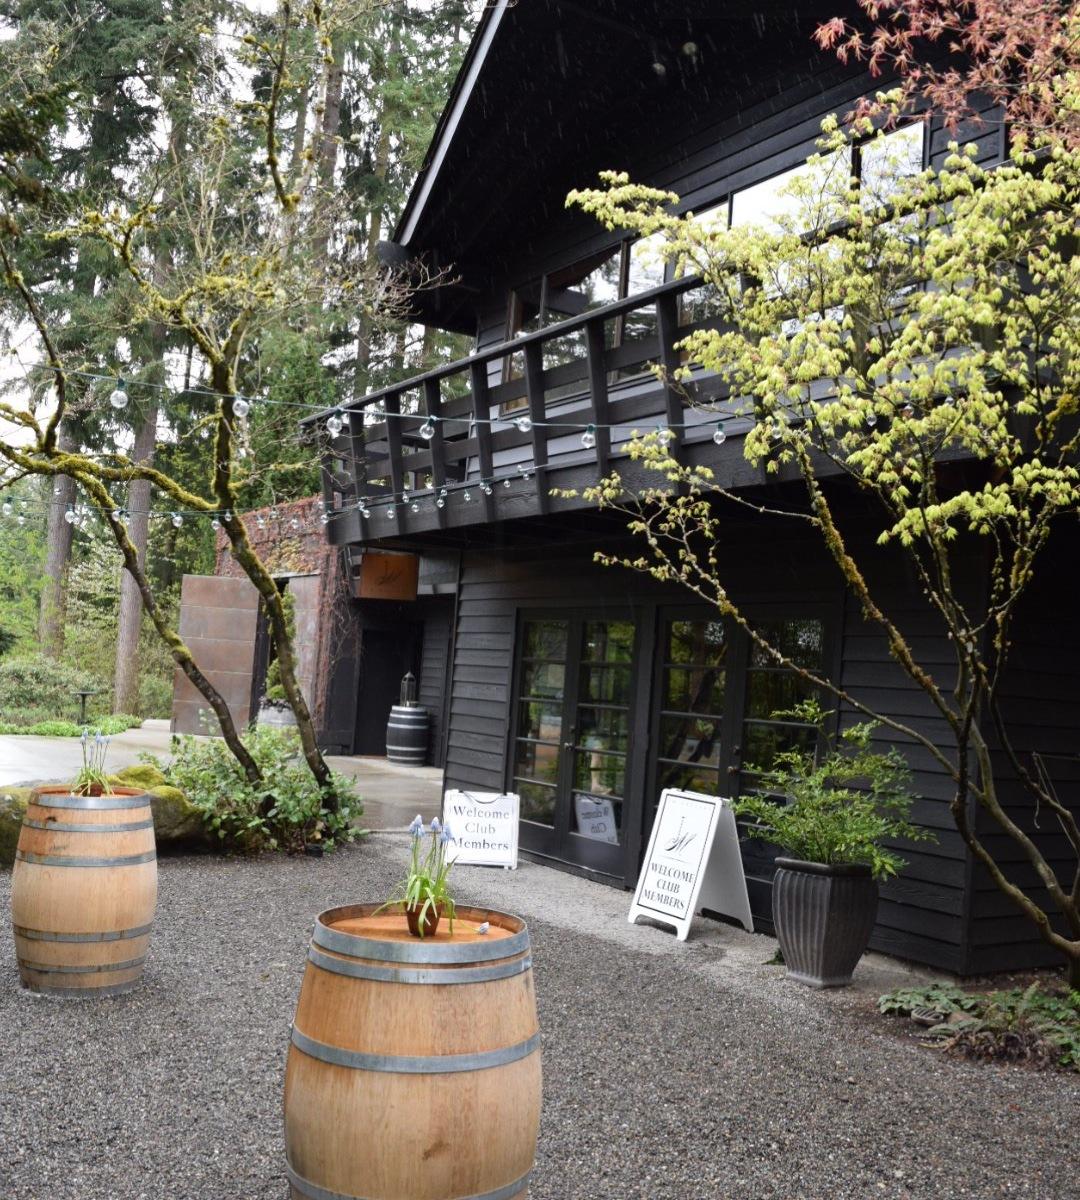 JM Cellars Woodinville – Beautiful Wines in a Beautiful Setting! – Abbey Co.